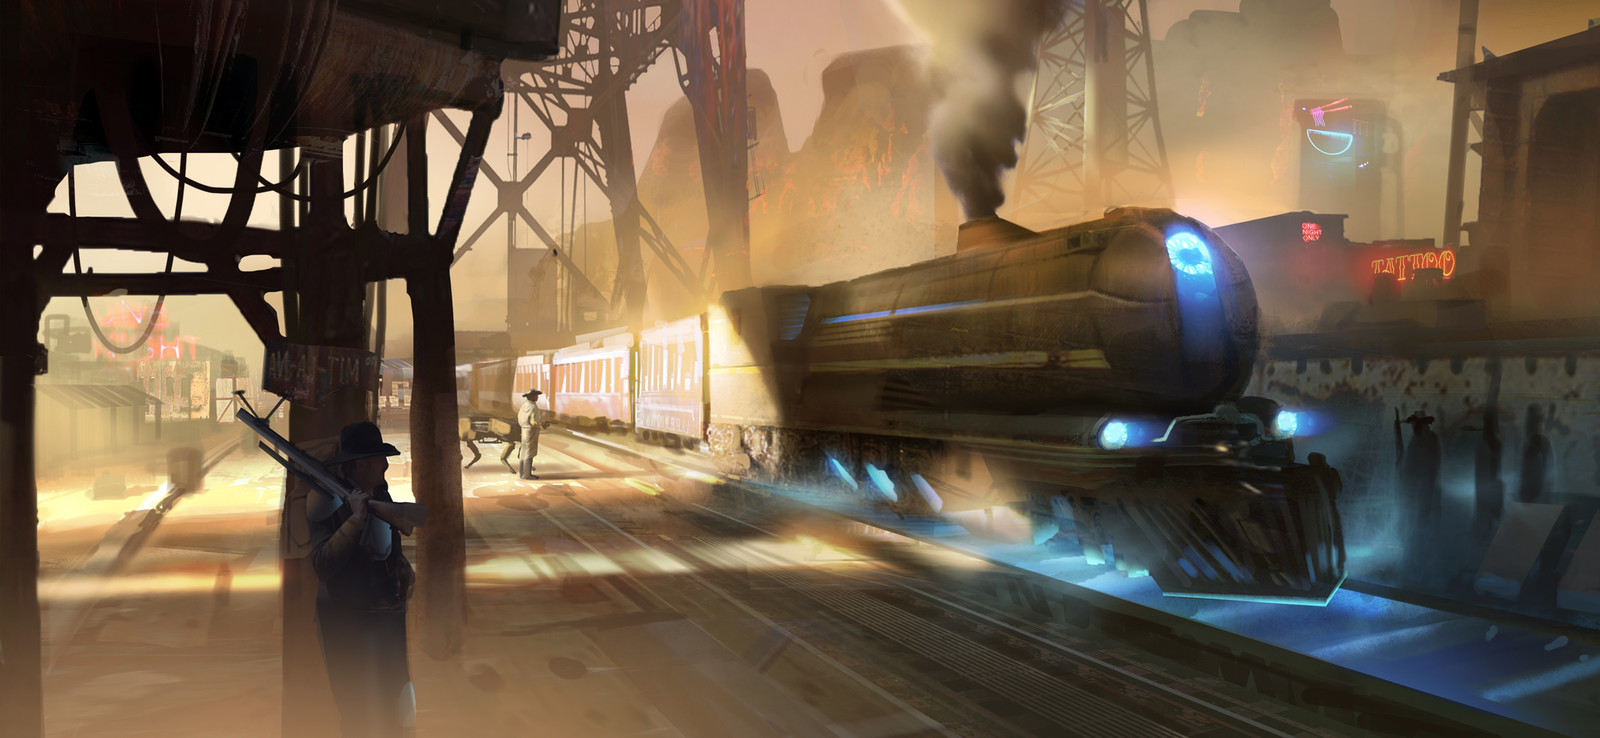 Western Diesel-Punk III (Cancelled Game)